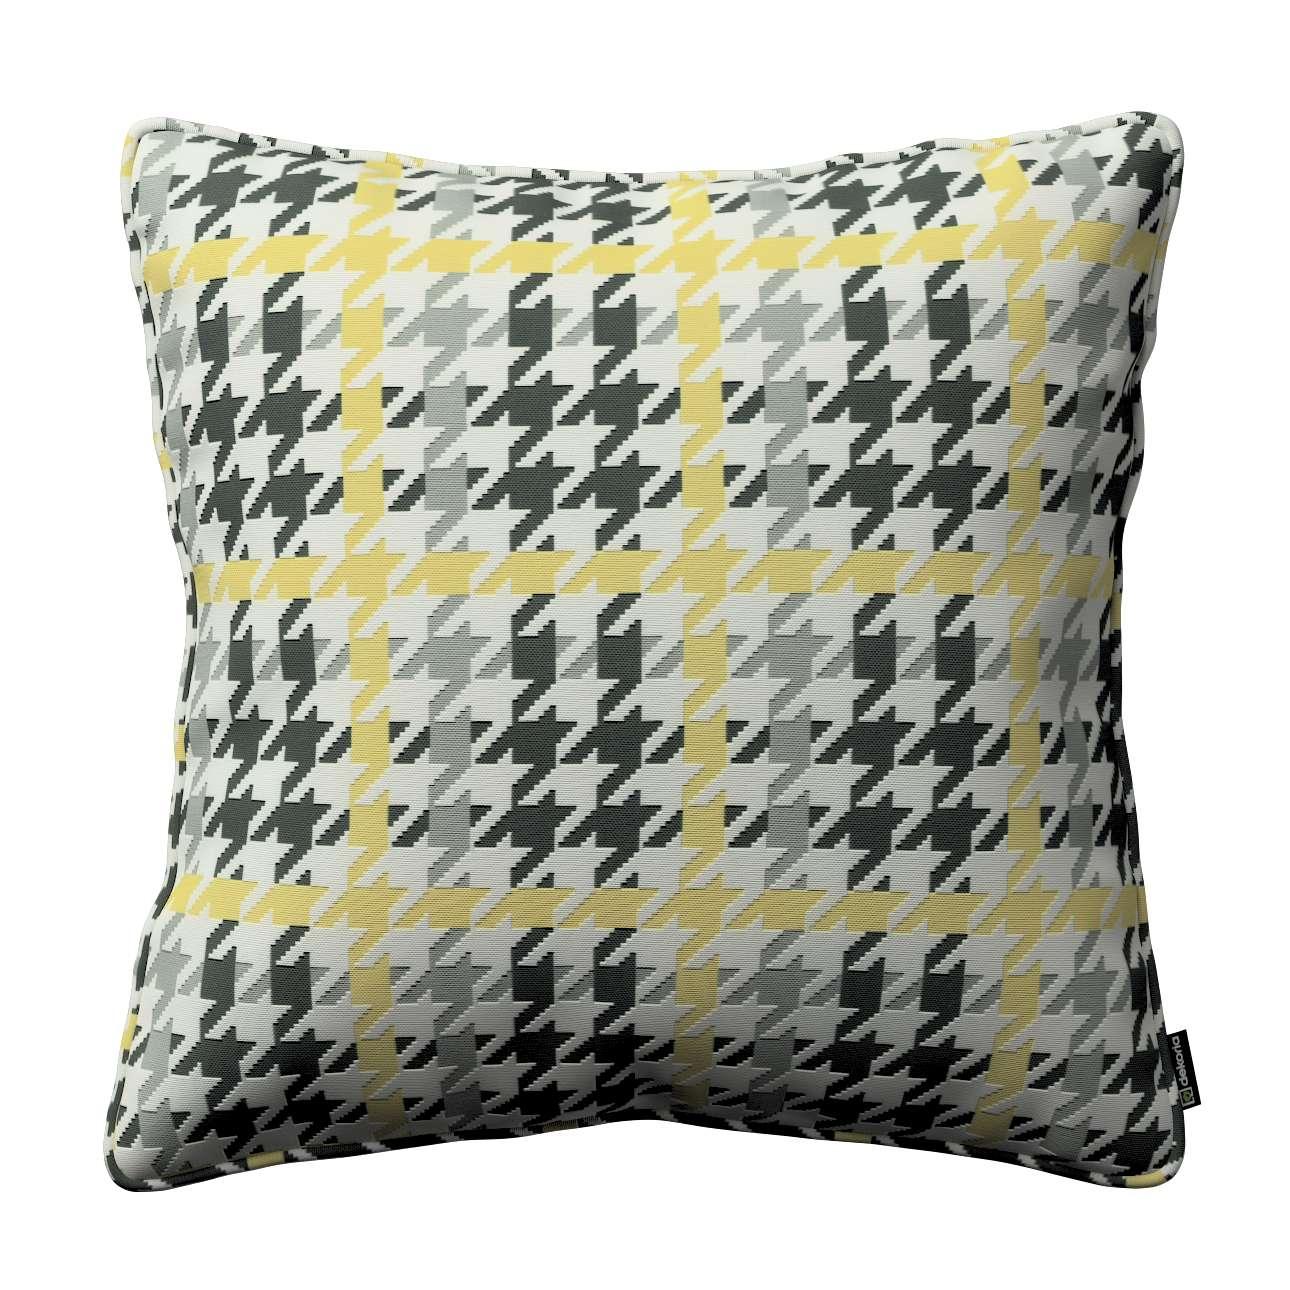 Poszewka Gabi na poduszkę 45 x 45 cm w kolekcji Brooklyn, tkanina: 137-79